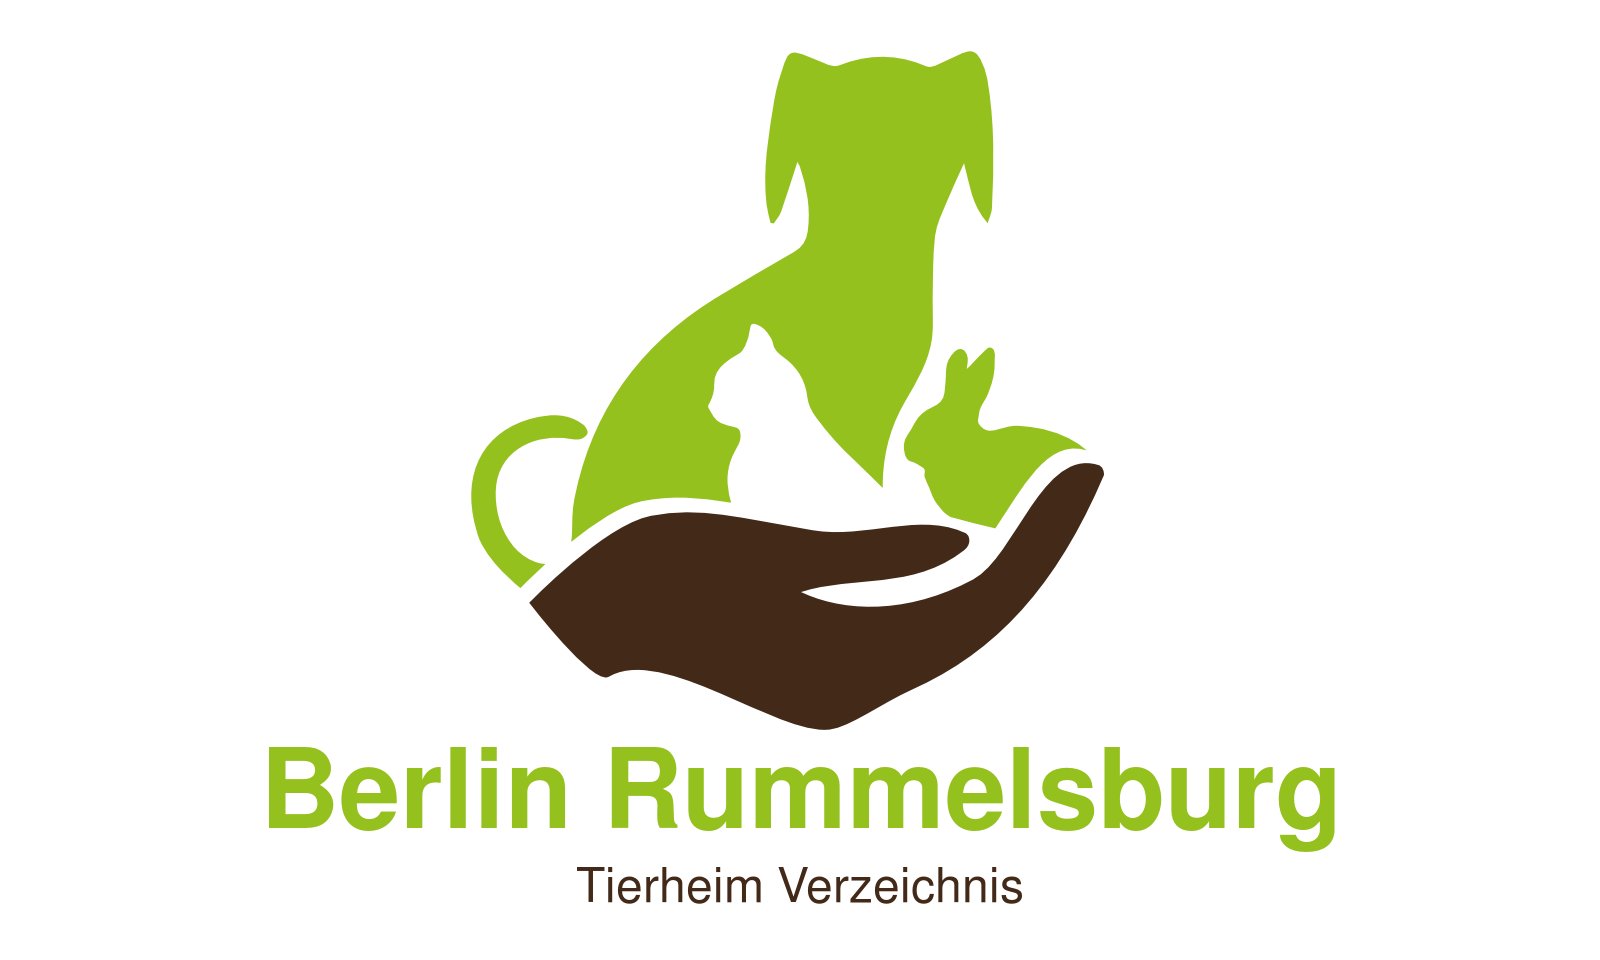 Tierheim Berlin Rummelsburg